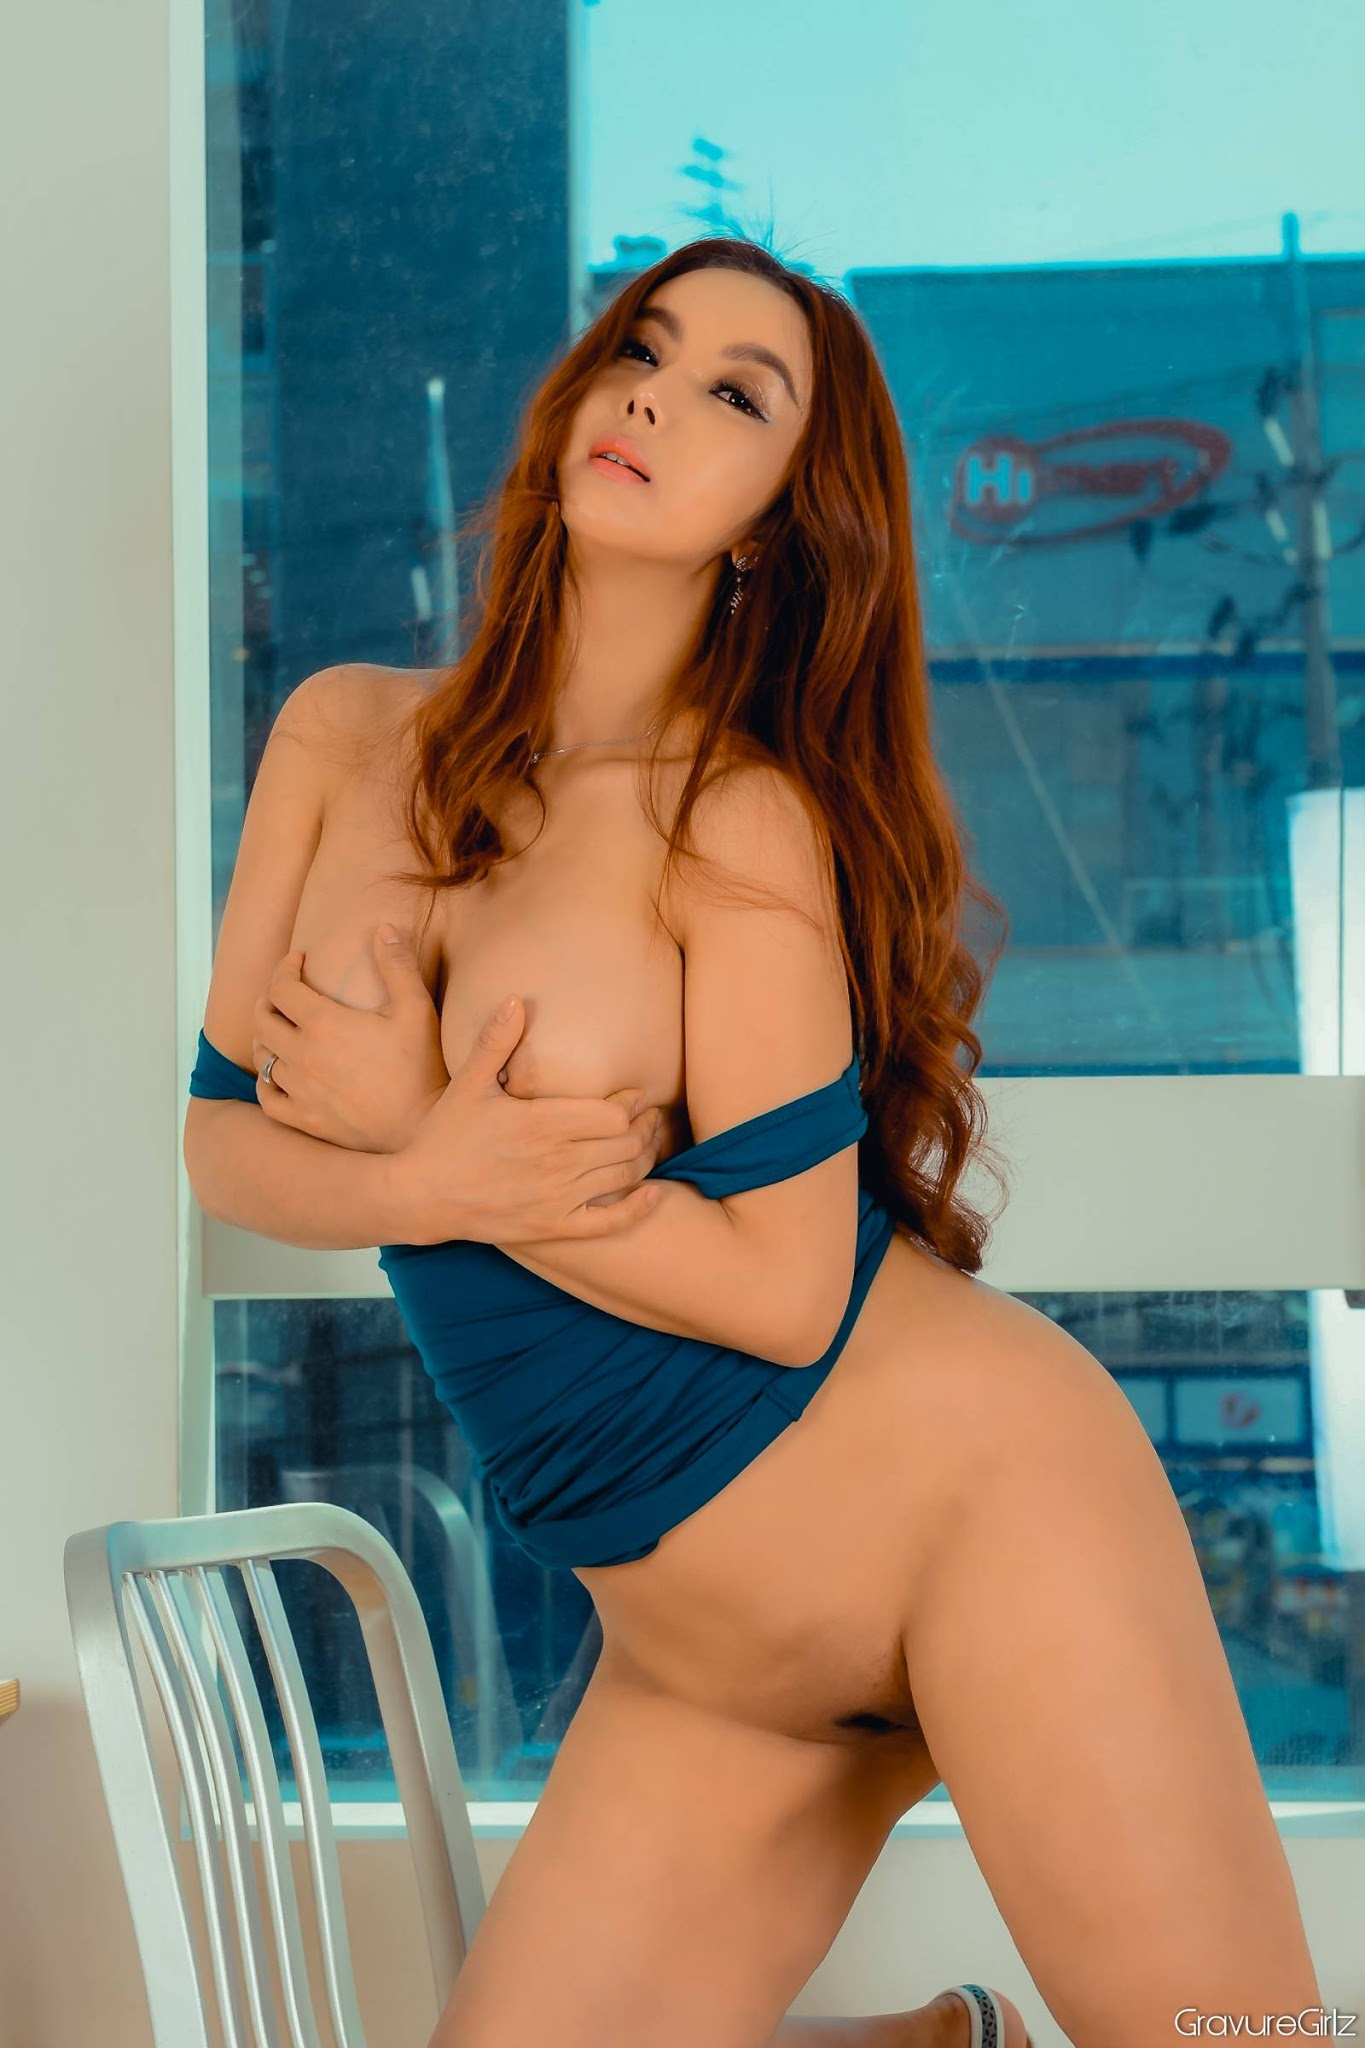 Power rangers female nude